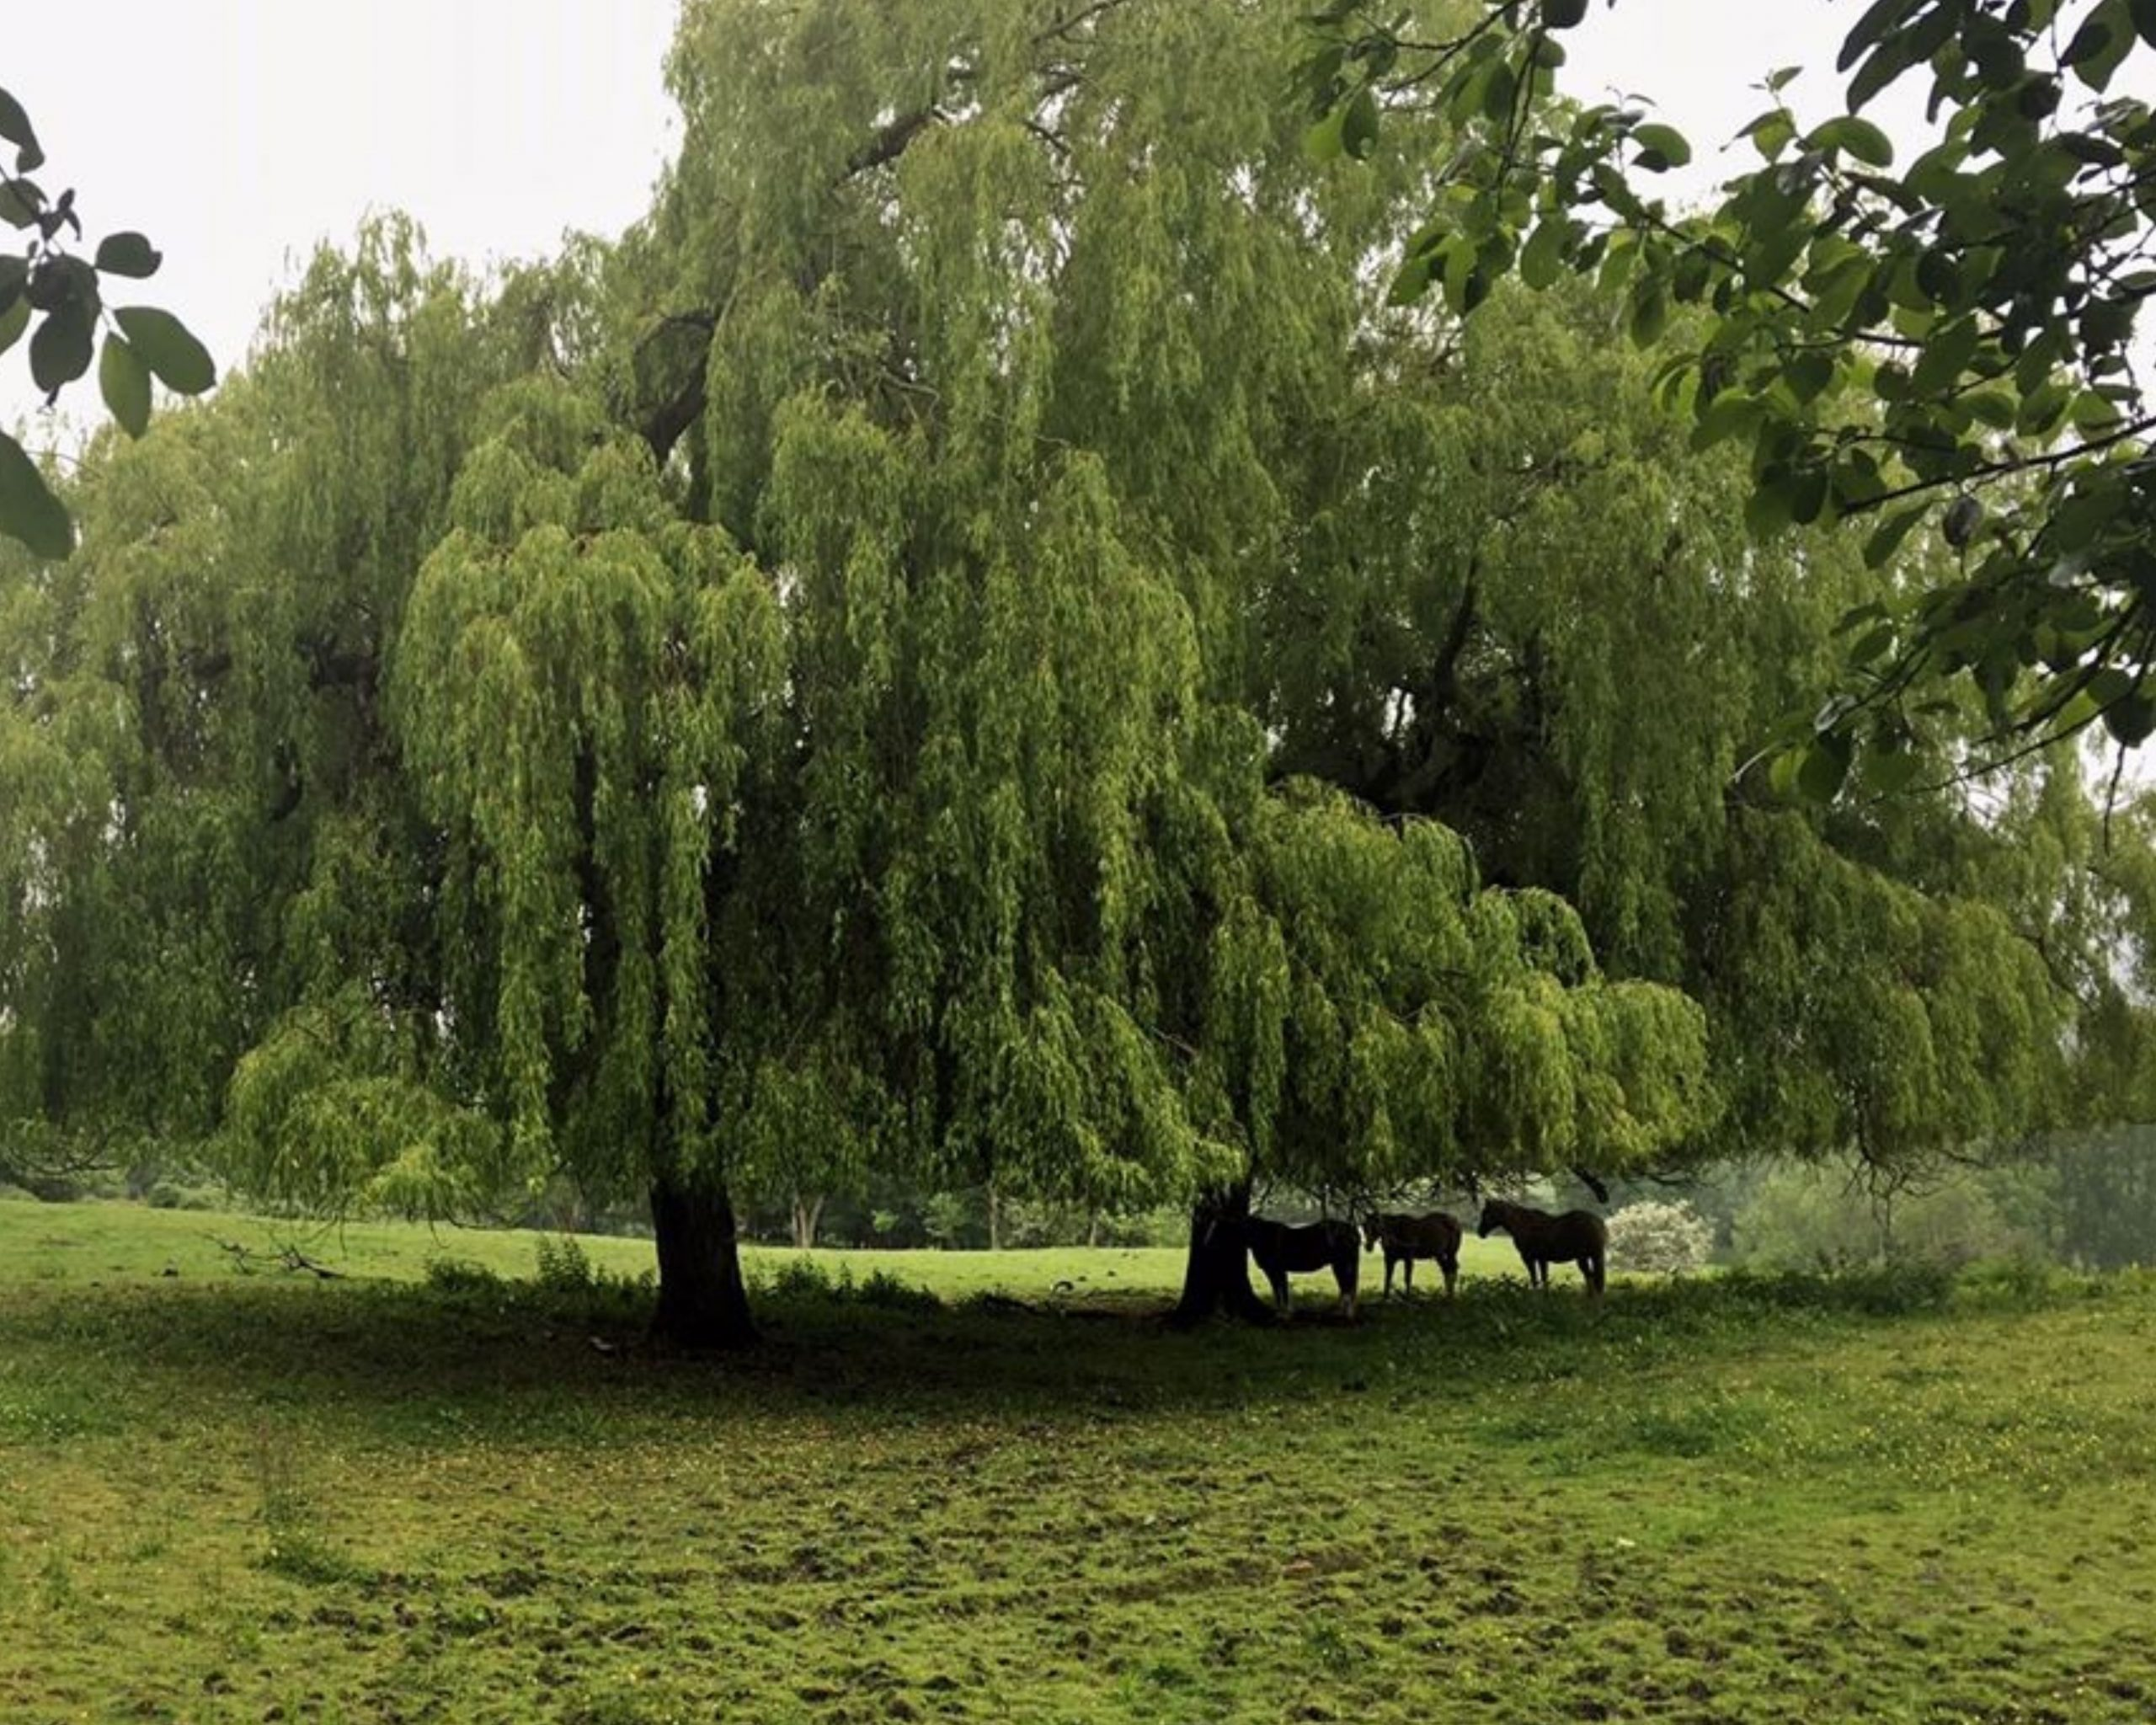 Horses sheltering under a tree